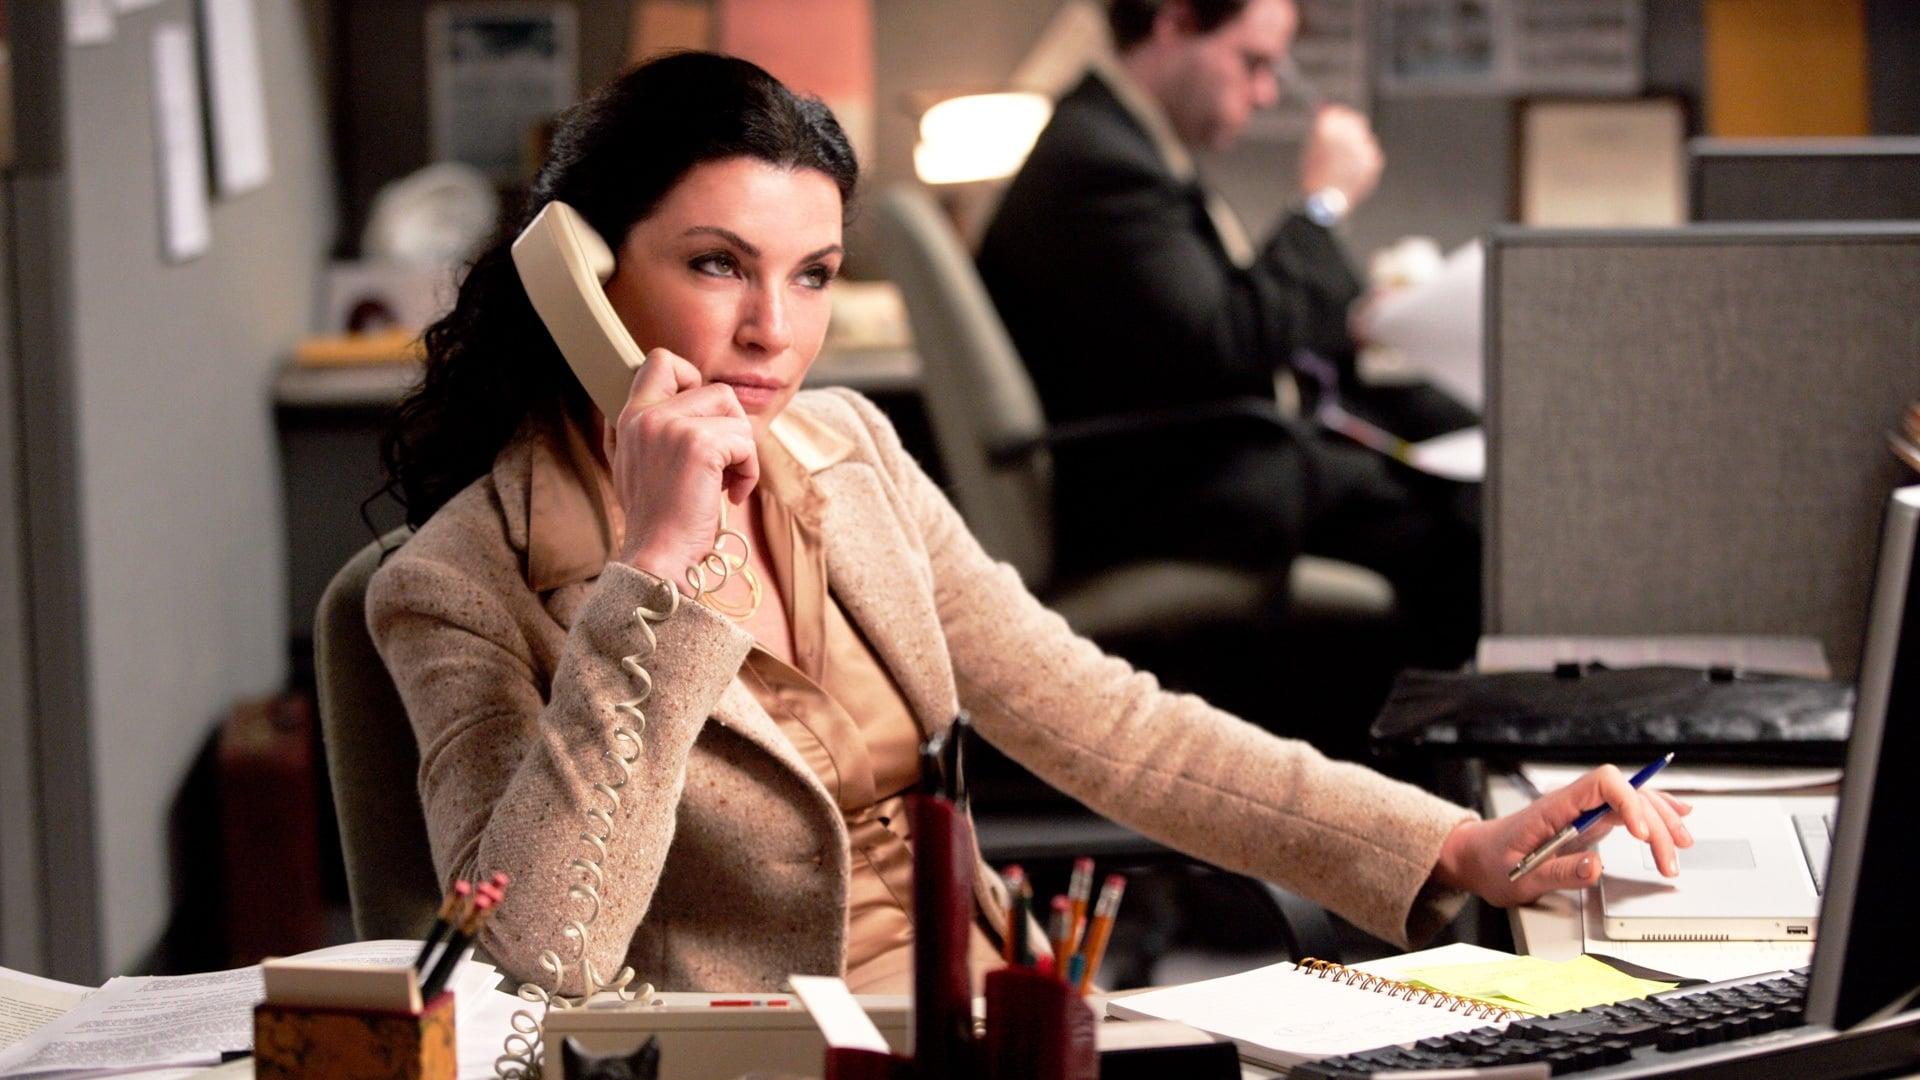 The Sopranos: Season 6 x Episode 11 - free to watch online